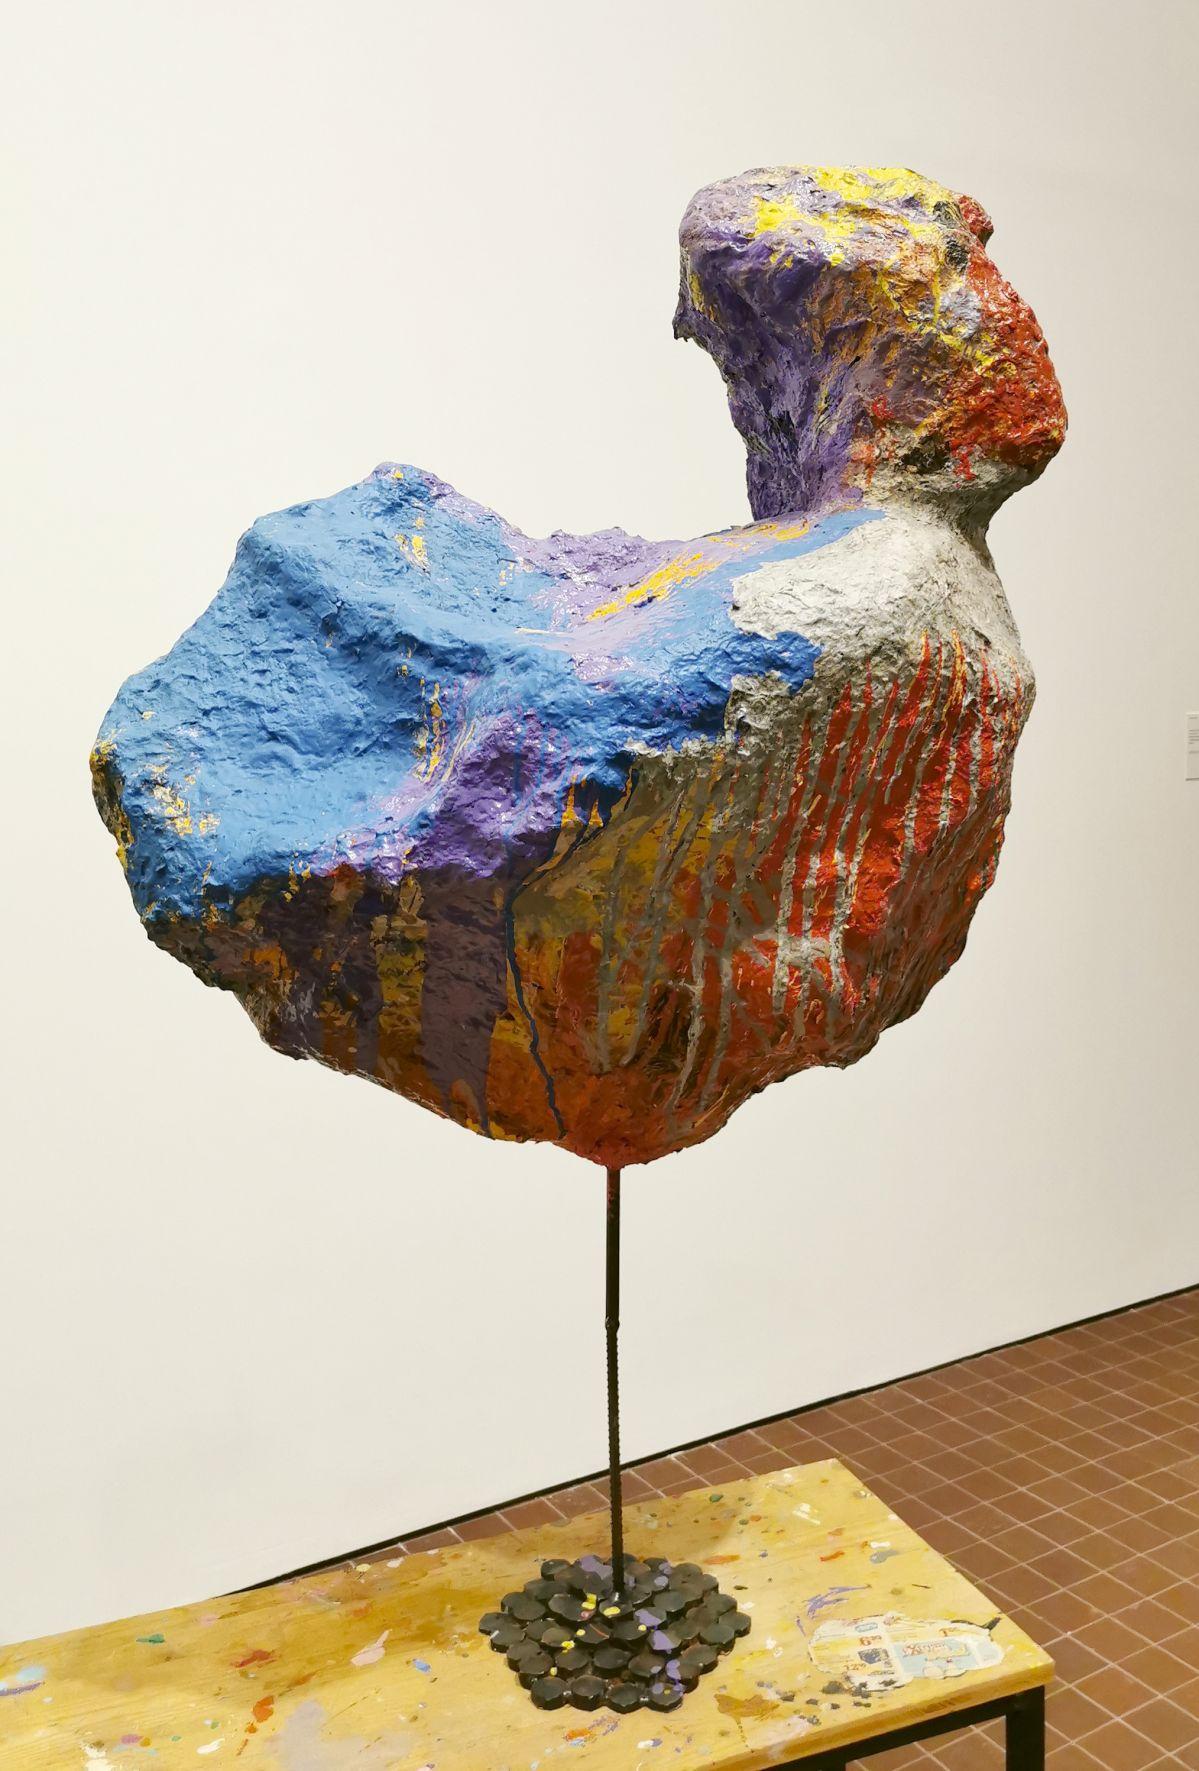 Franz West - Sans titre, 2009 - The Impermanent Display , Collection Maja Hoffmann - Luma Arles 2021